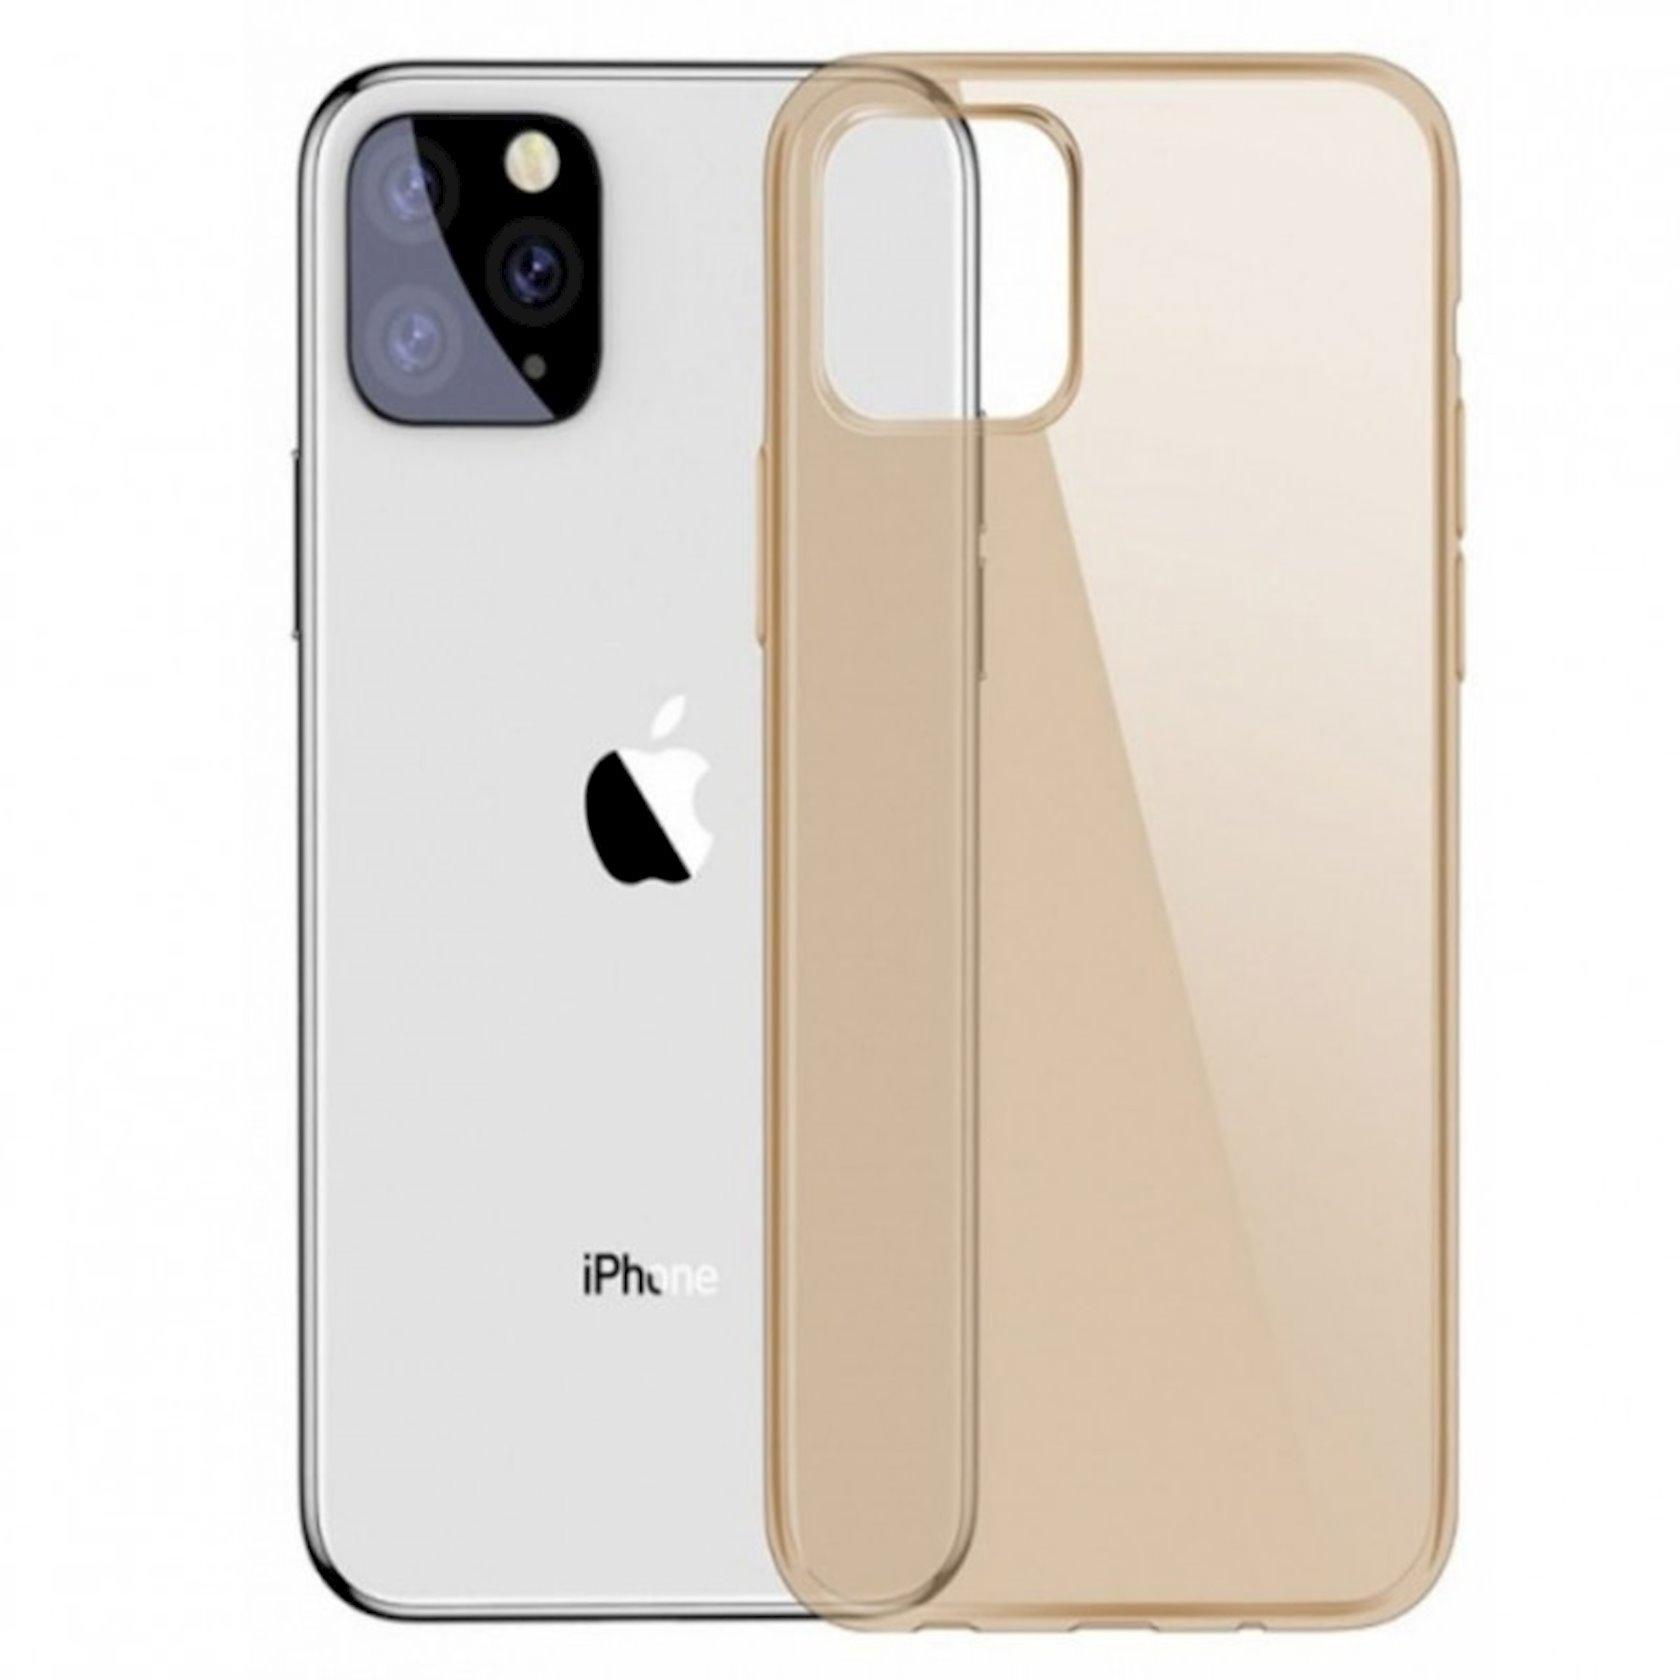 Çexol Baseus Simplicity Series Basic Model iPhone 11 Pro 5.8 inch 2019, şəffaf qızılı